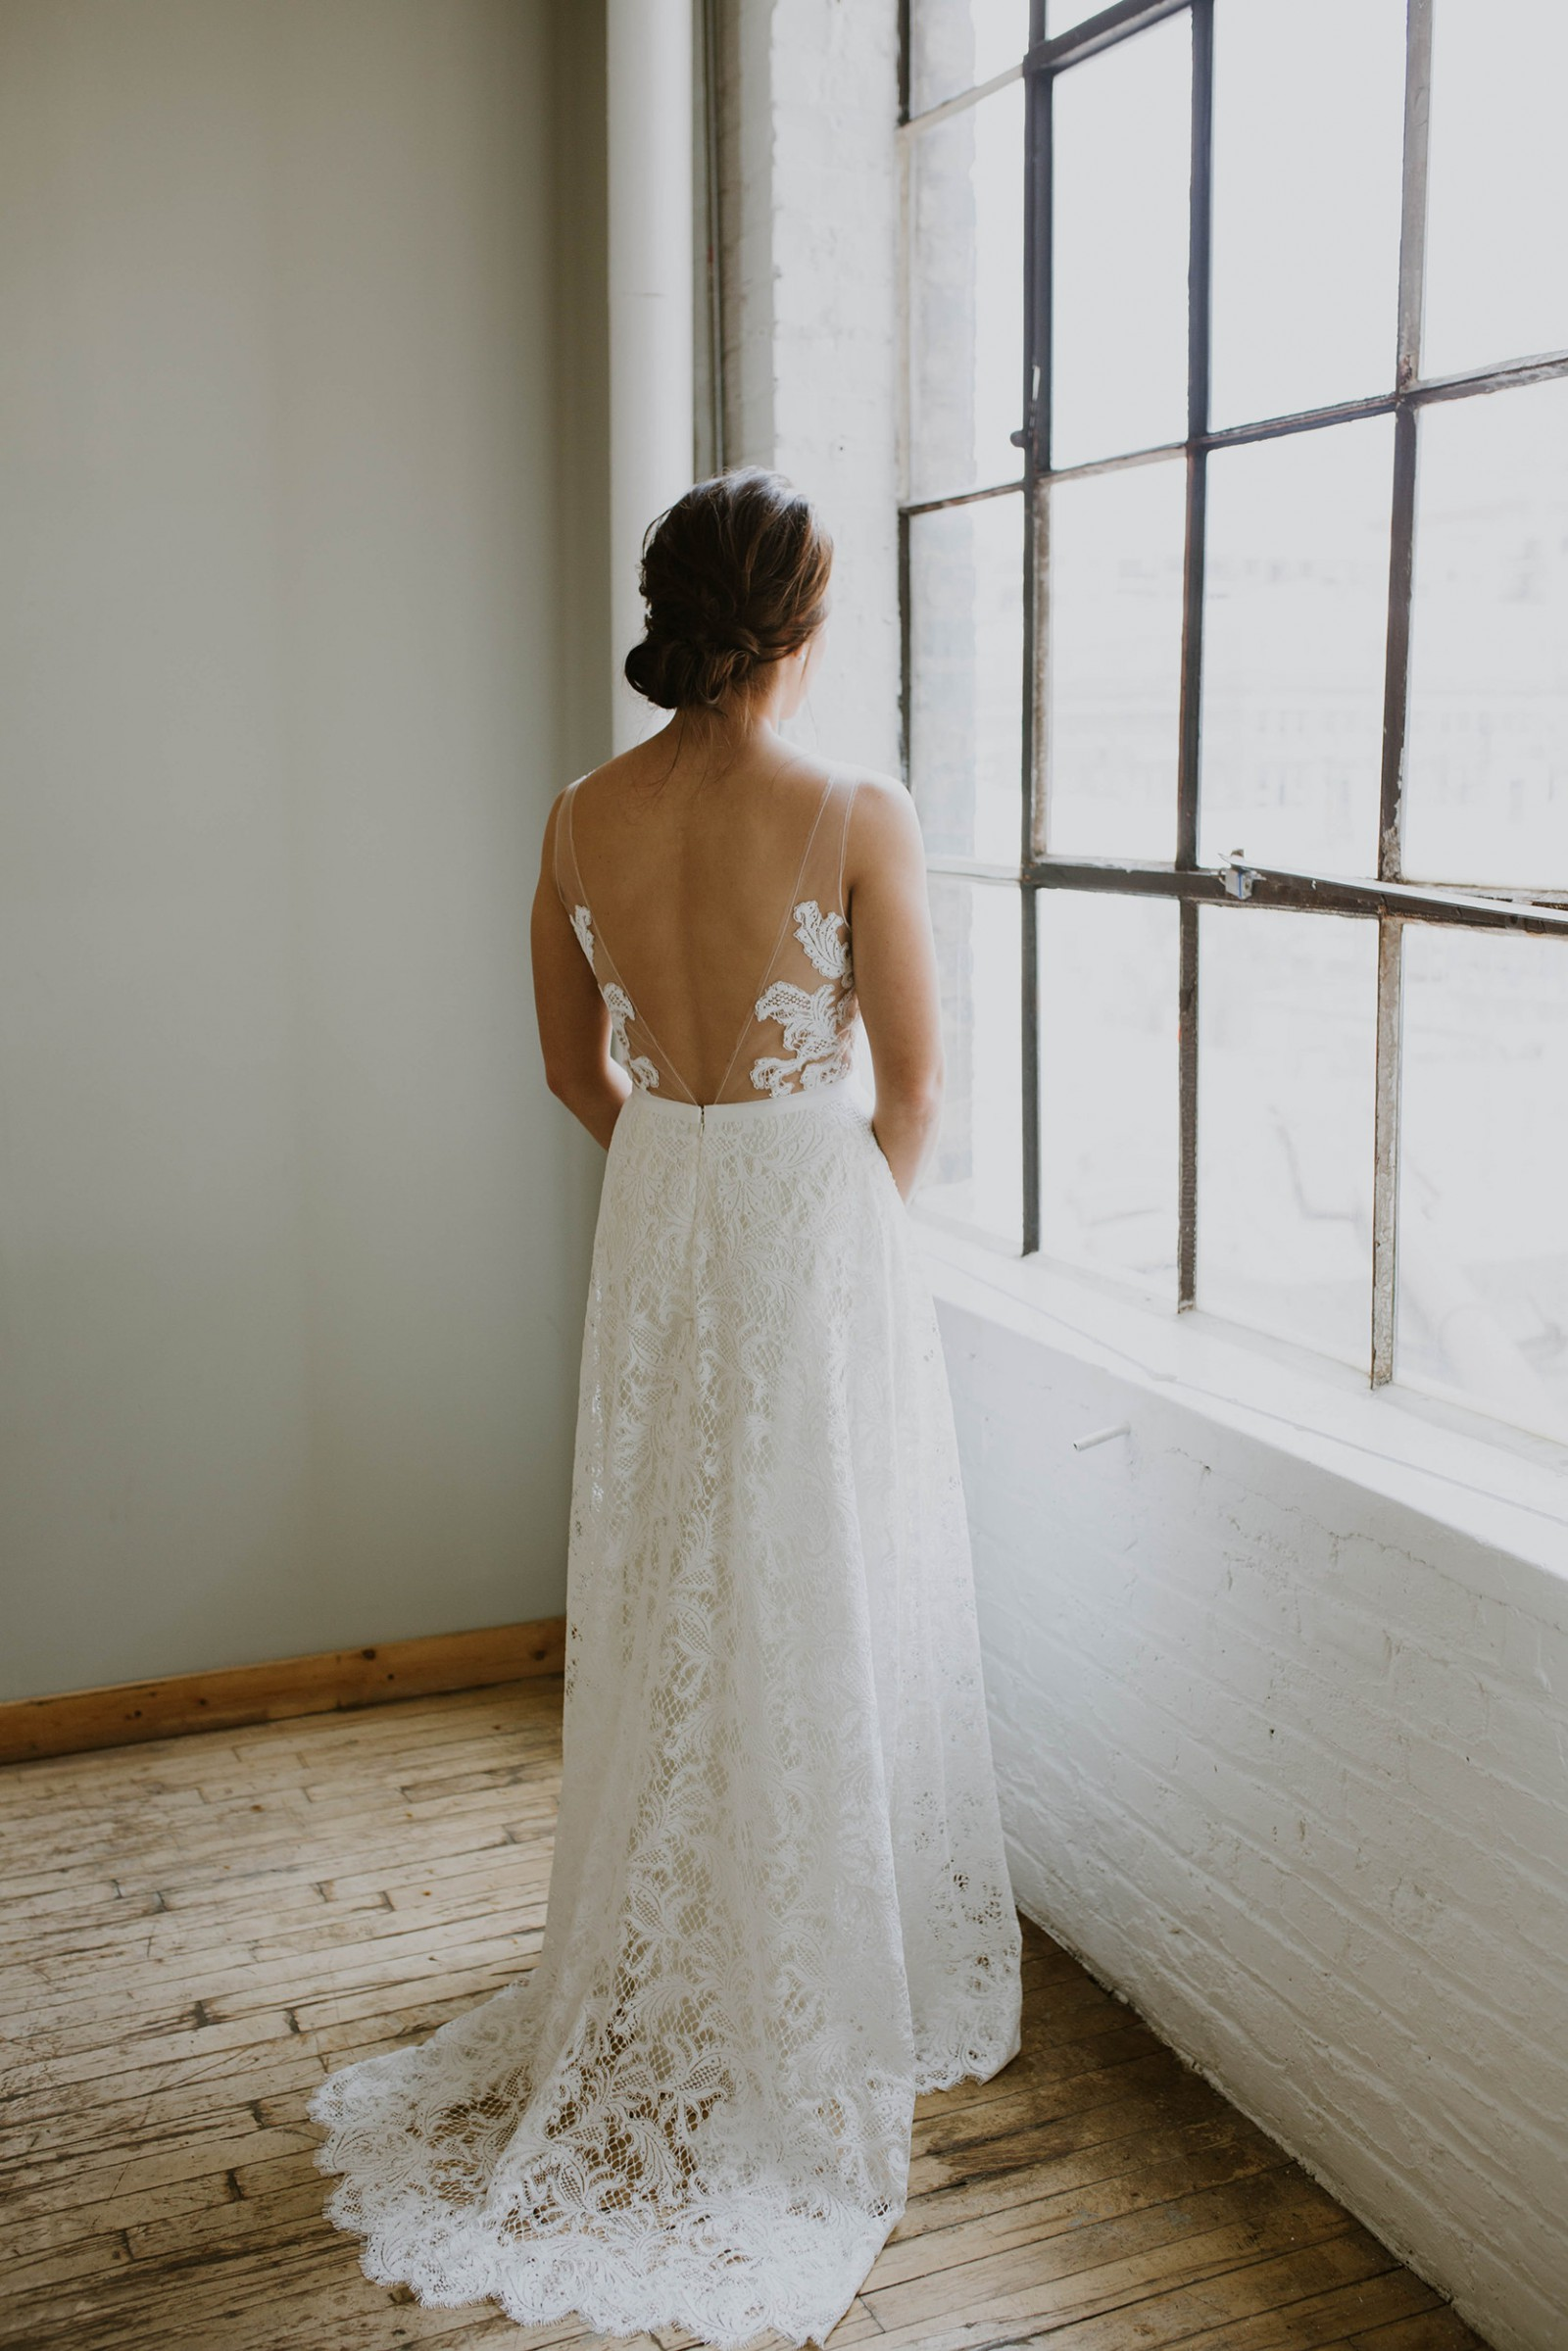 3a1b186f51c Willowby Asa Used Wedding Dress on Sale 44% Off - Stillwhite